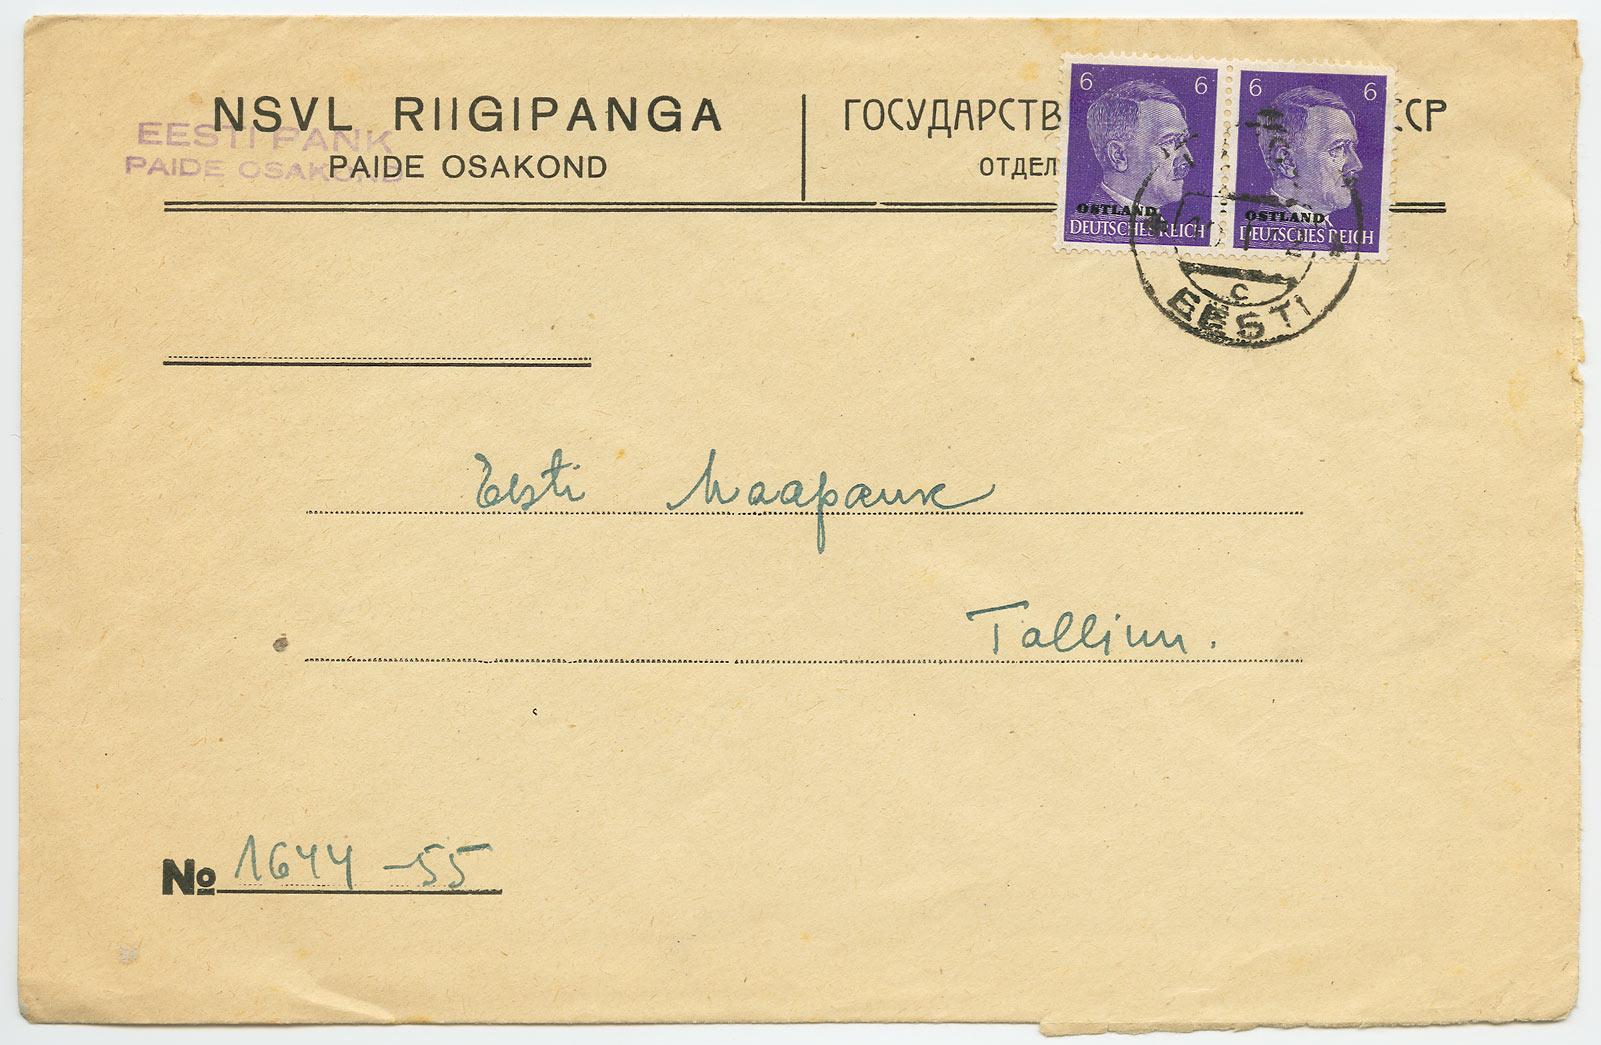 0368-NSVL-Riigipanga-Paide-